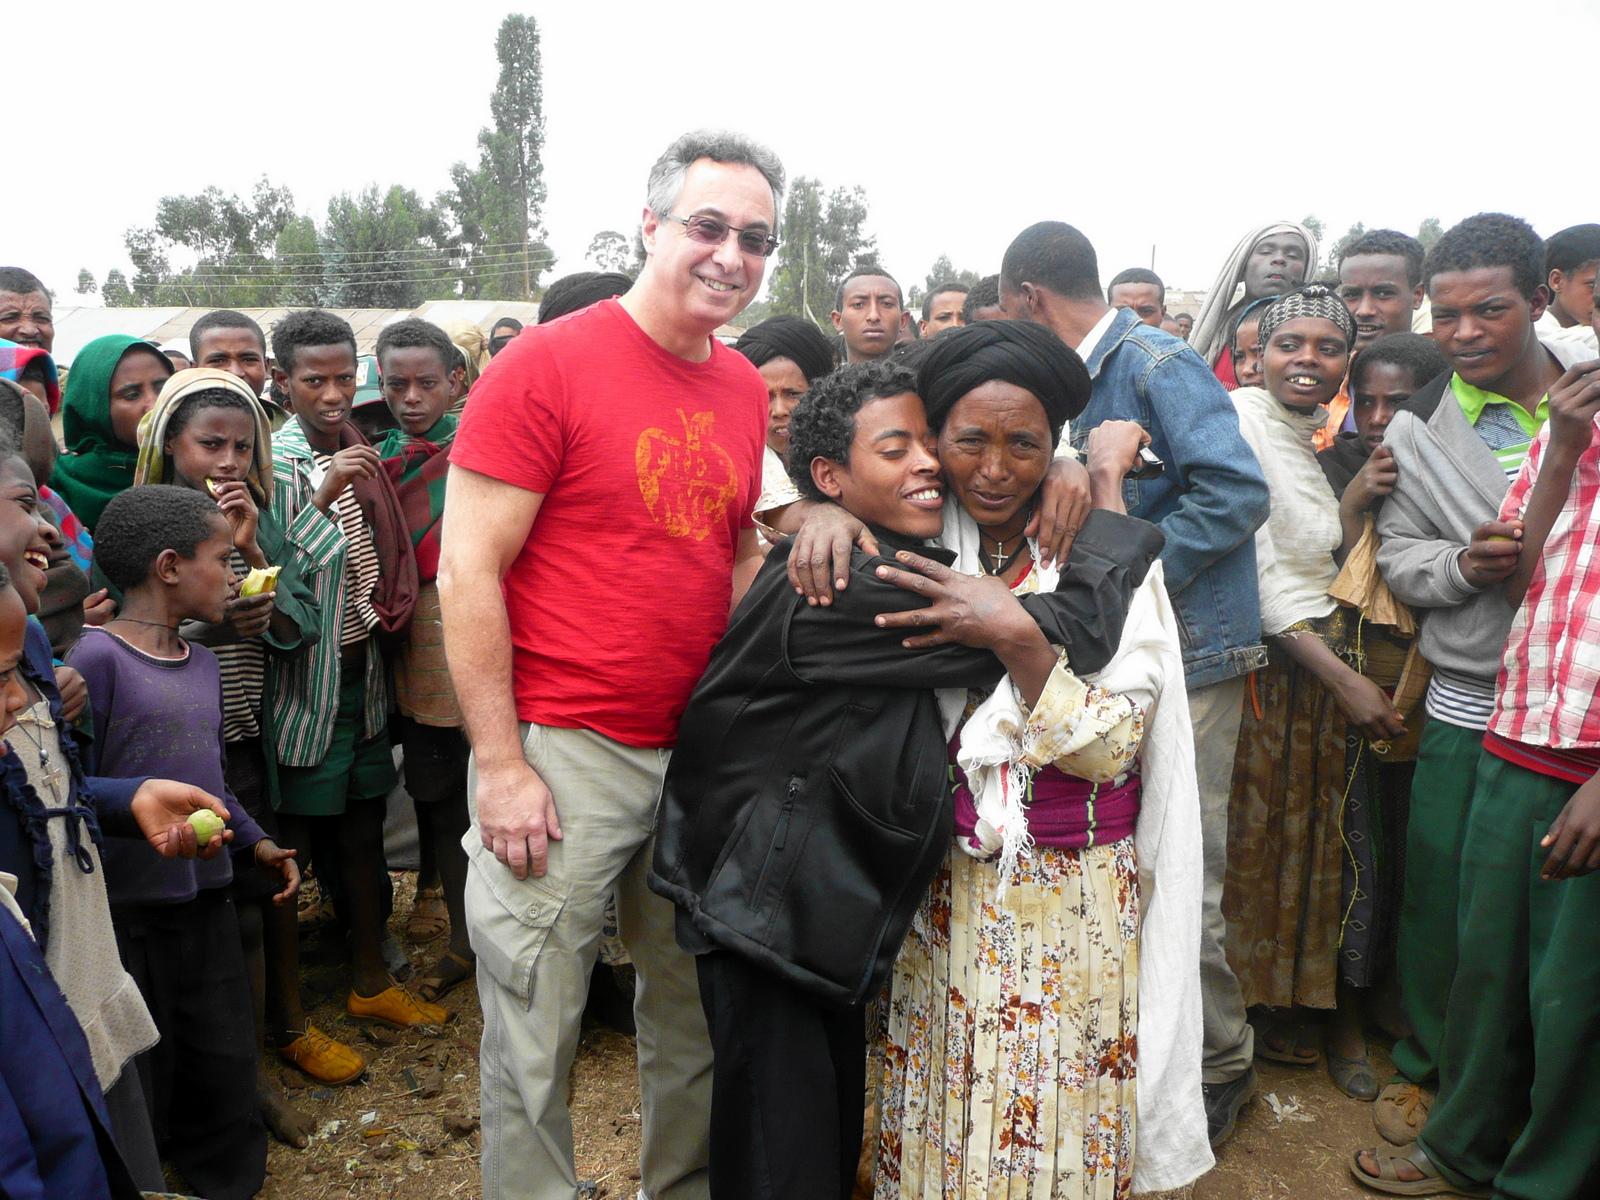 Tesfaye Reunited with Mother Yeshi